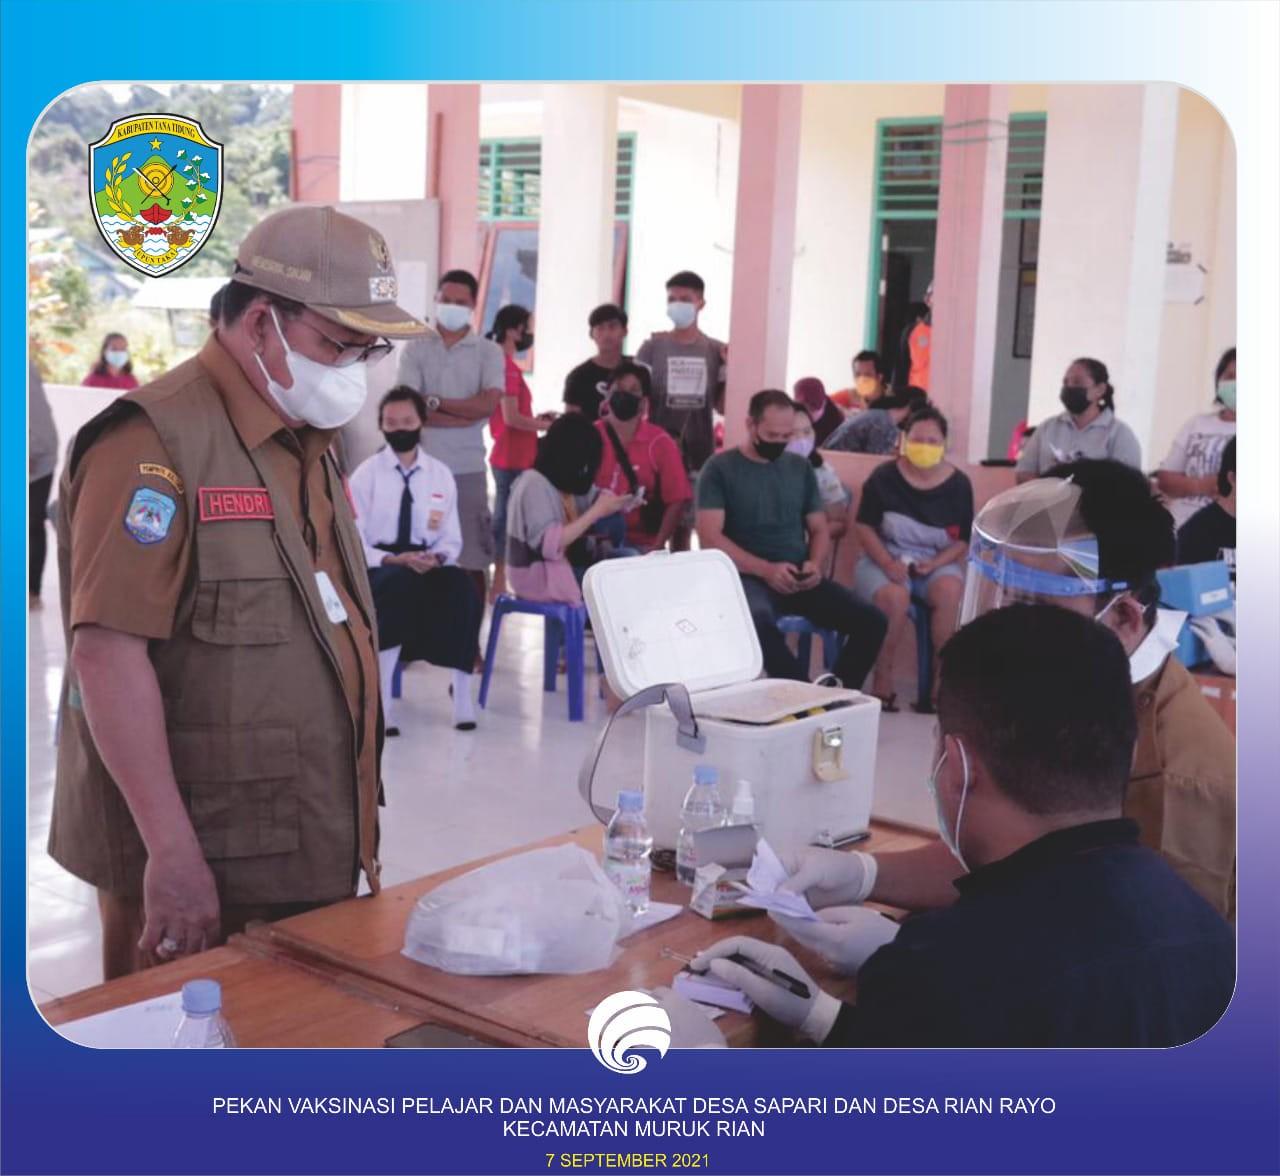 Wakil Bupati KTT Monitoring Vaksinasi Covid-19 untuk Masyarakat